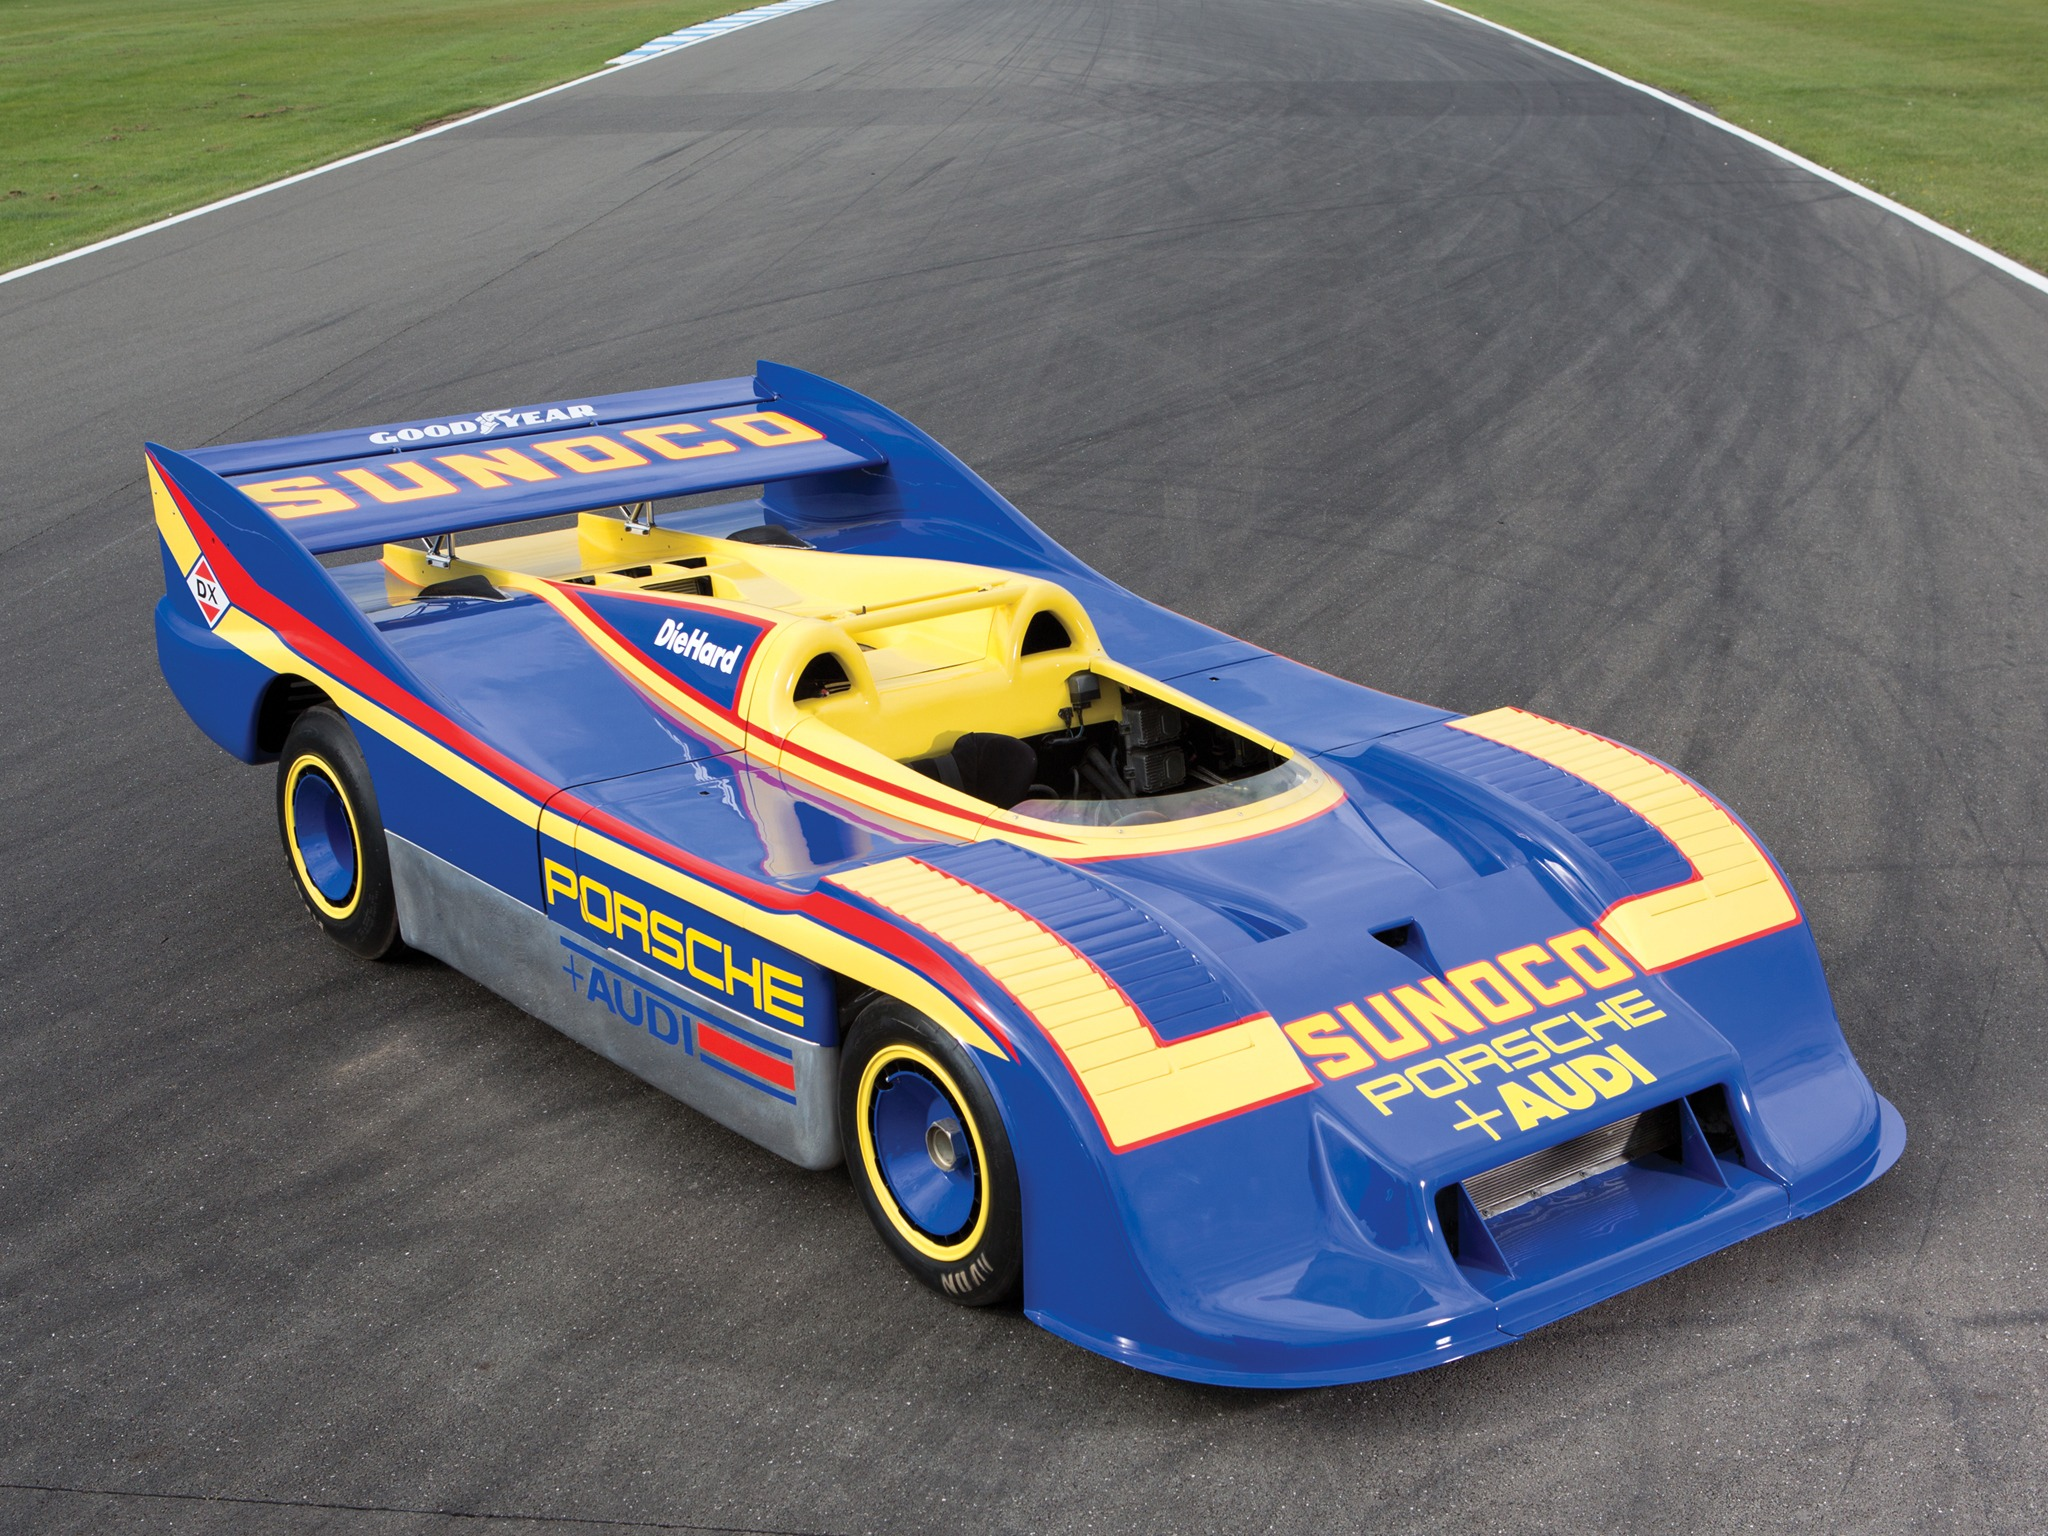 Porsche 917/30 Can-Am Spyder (1973) – Old Concept Cars